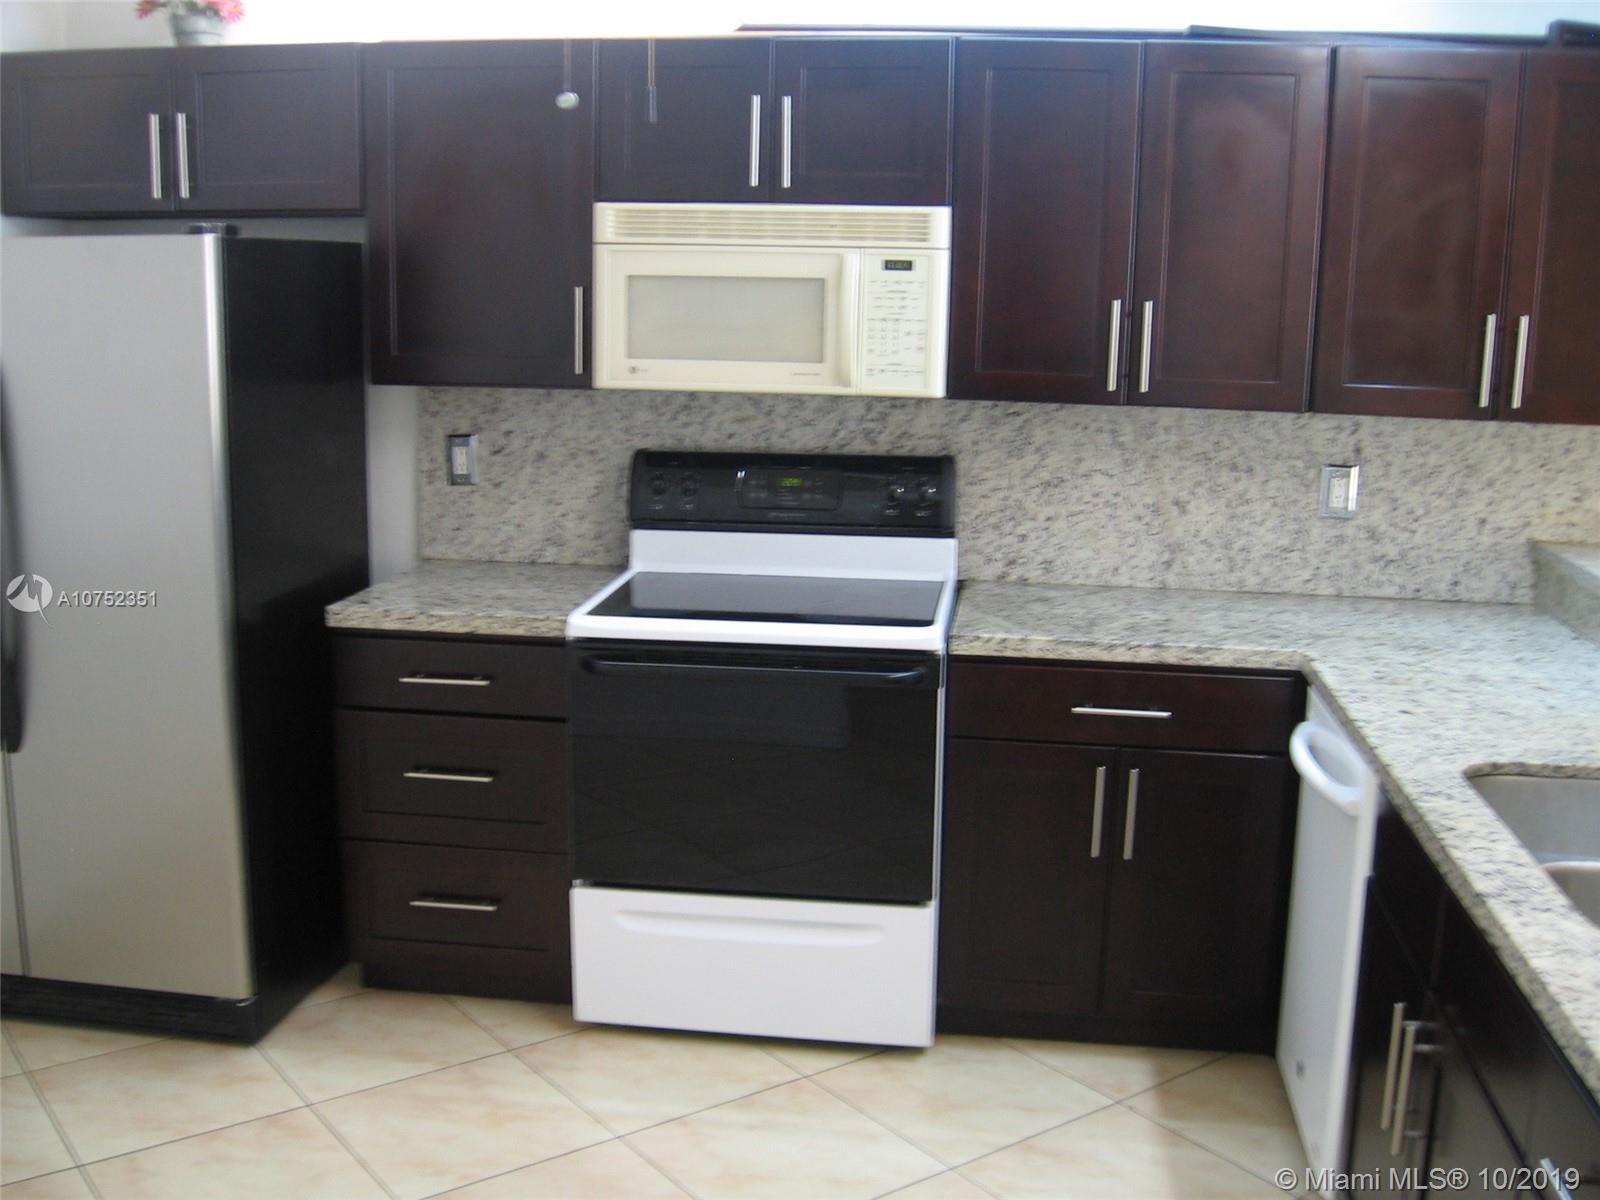 8020 Hampton Blvd # 303, North Lauderdale, Florida 33068, 2 Bedrooms Bedrooms, ,2 BathroomsBathrooms,Residential Lease,For Rent,8020 Hampton Blvd # 303,A10752351